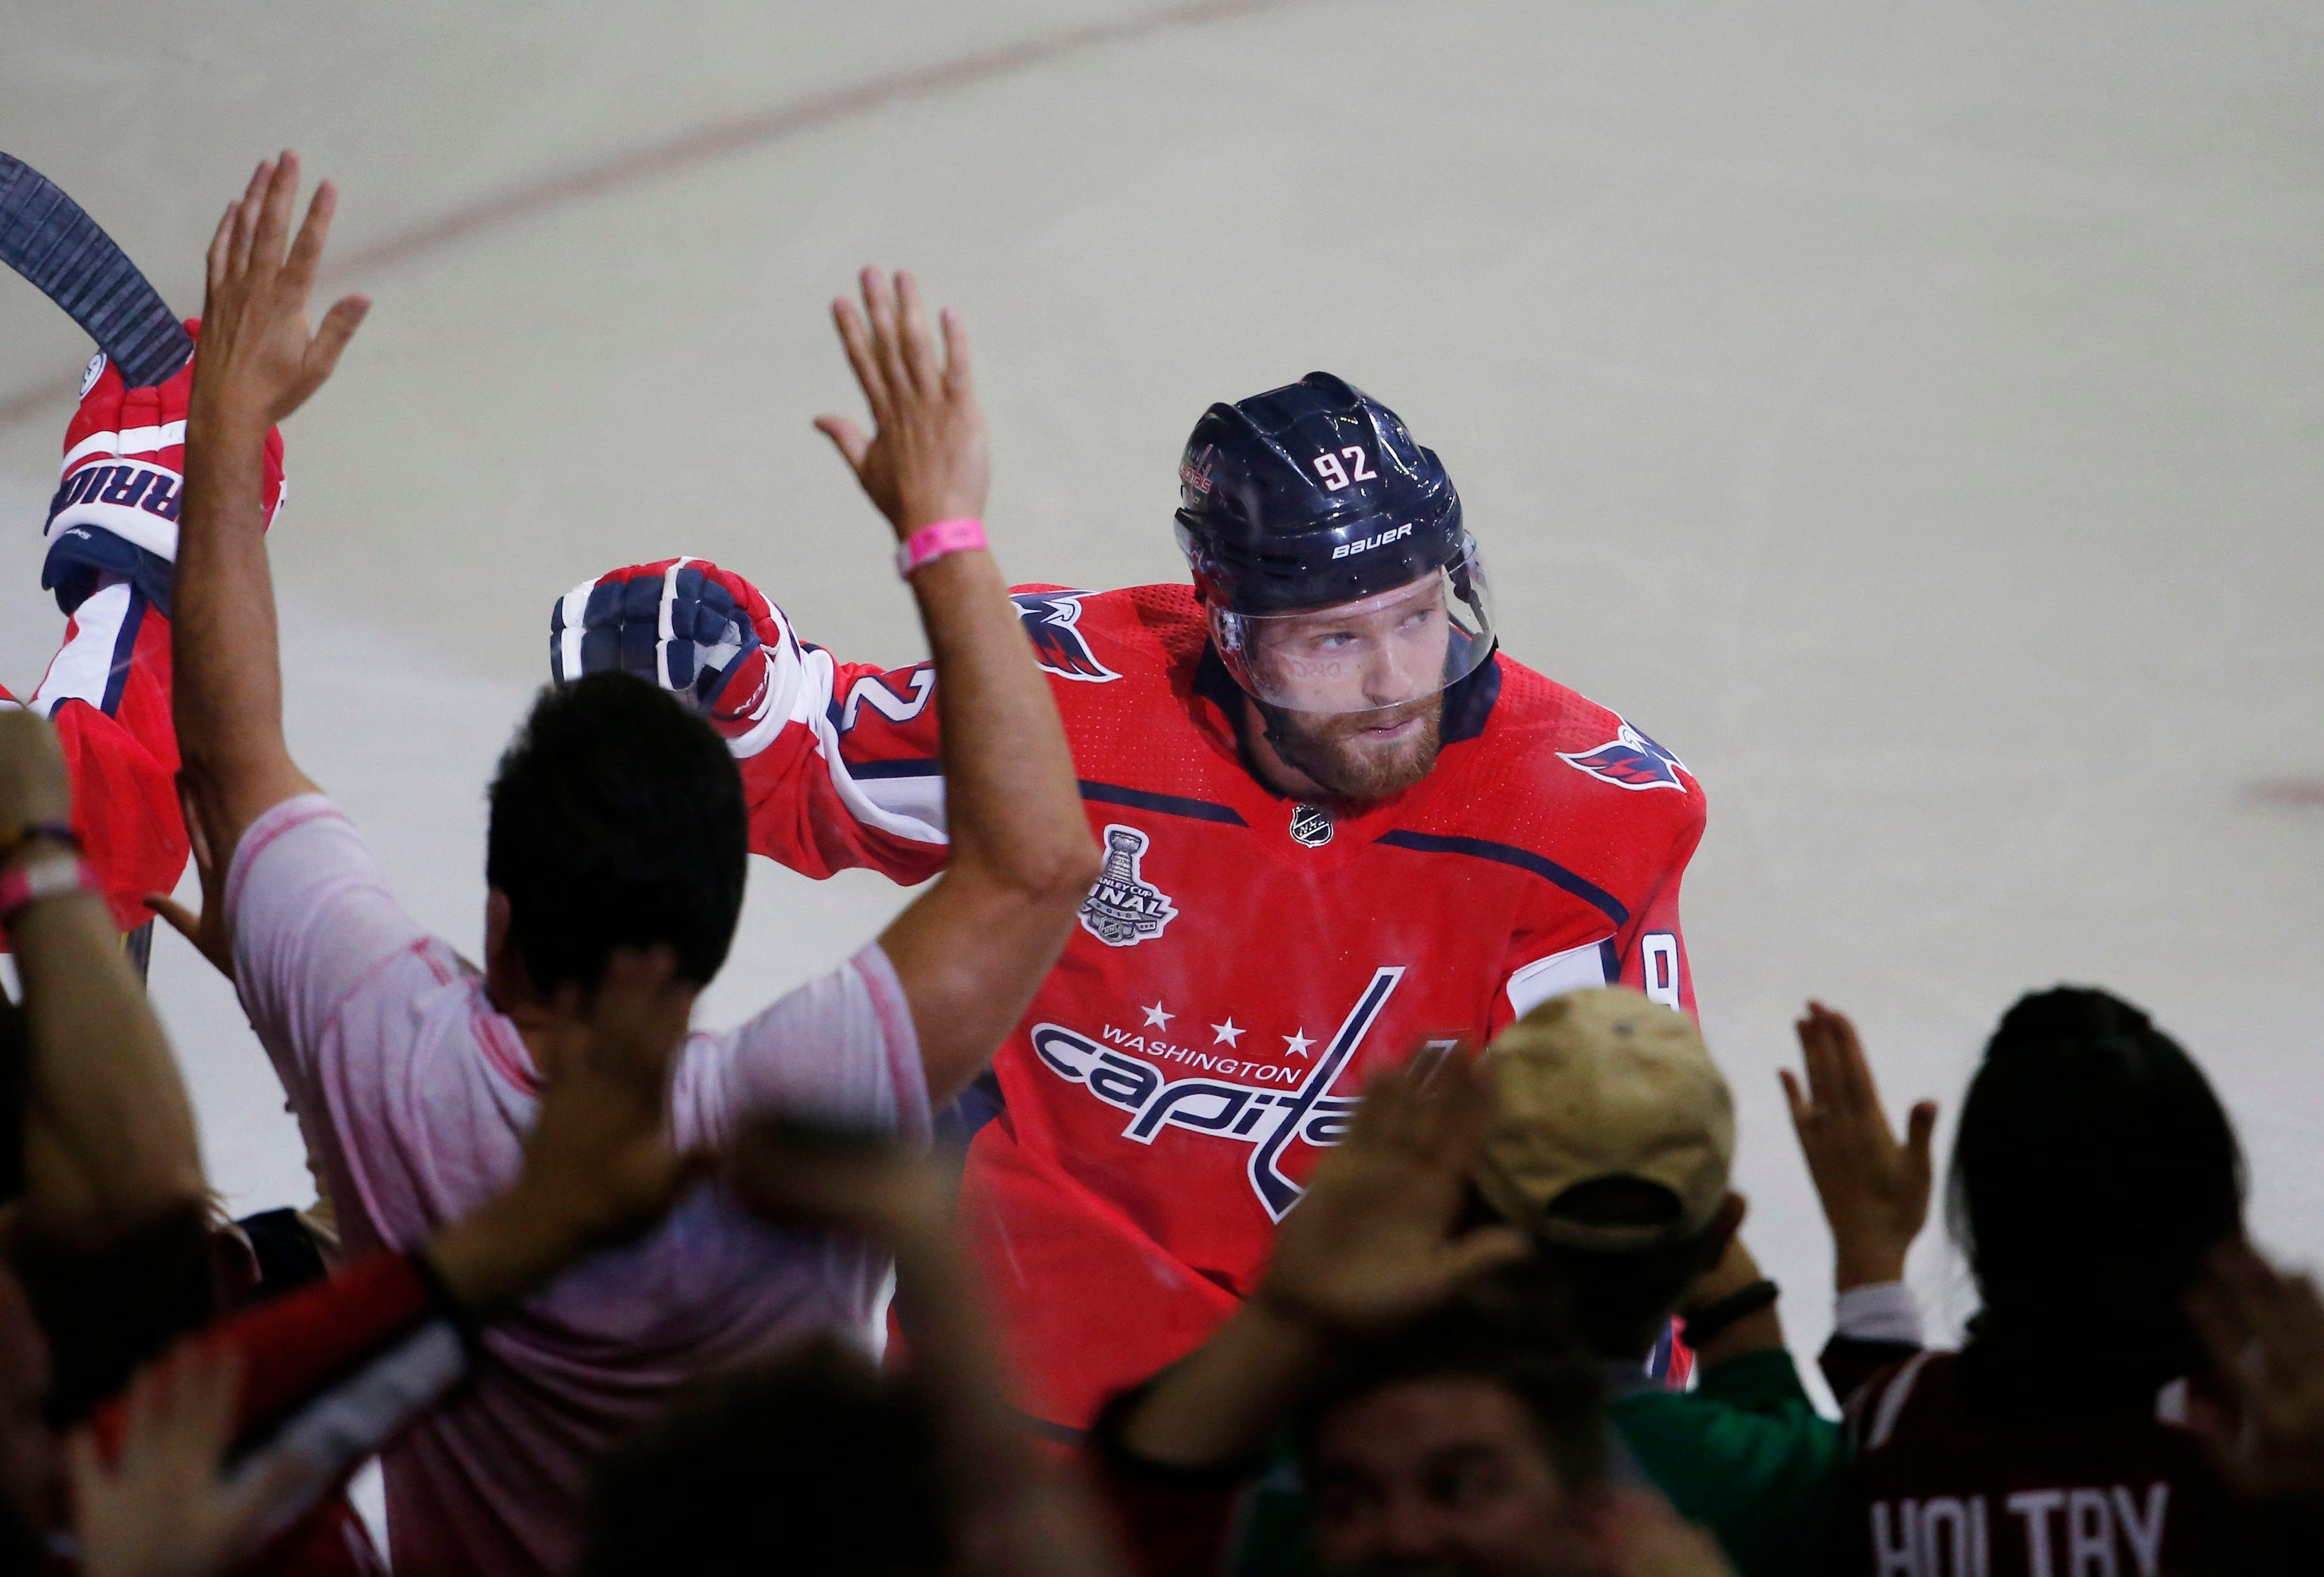 Washington Capitals' Evgeny Kuznetsov returns in Game 3, scores